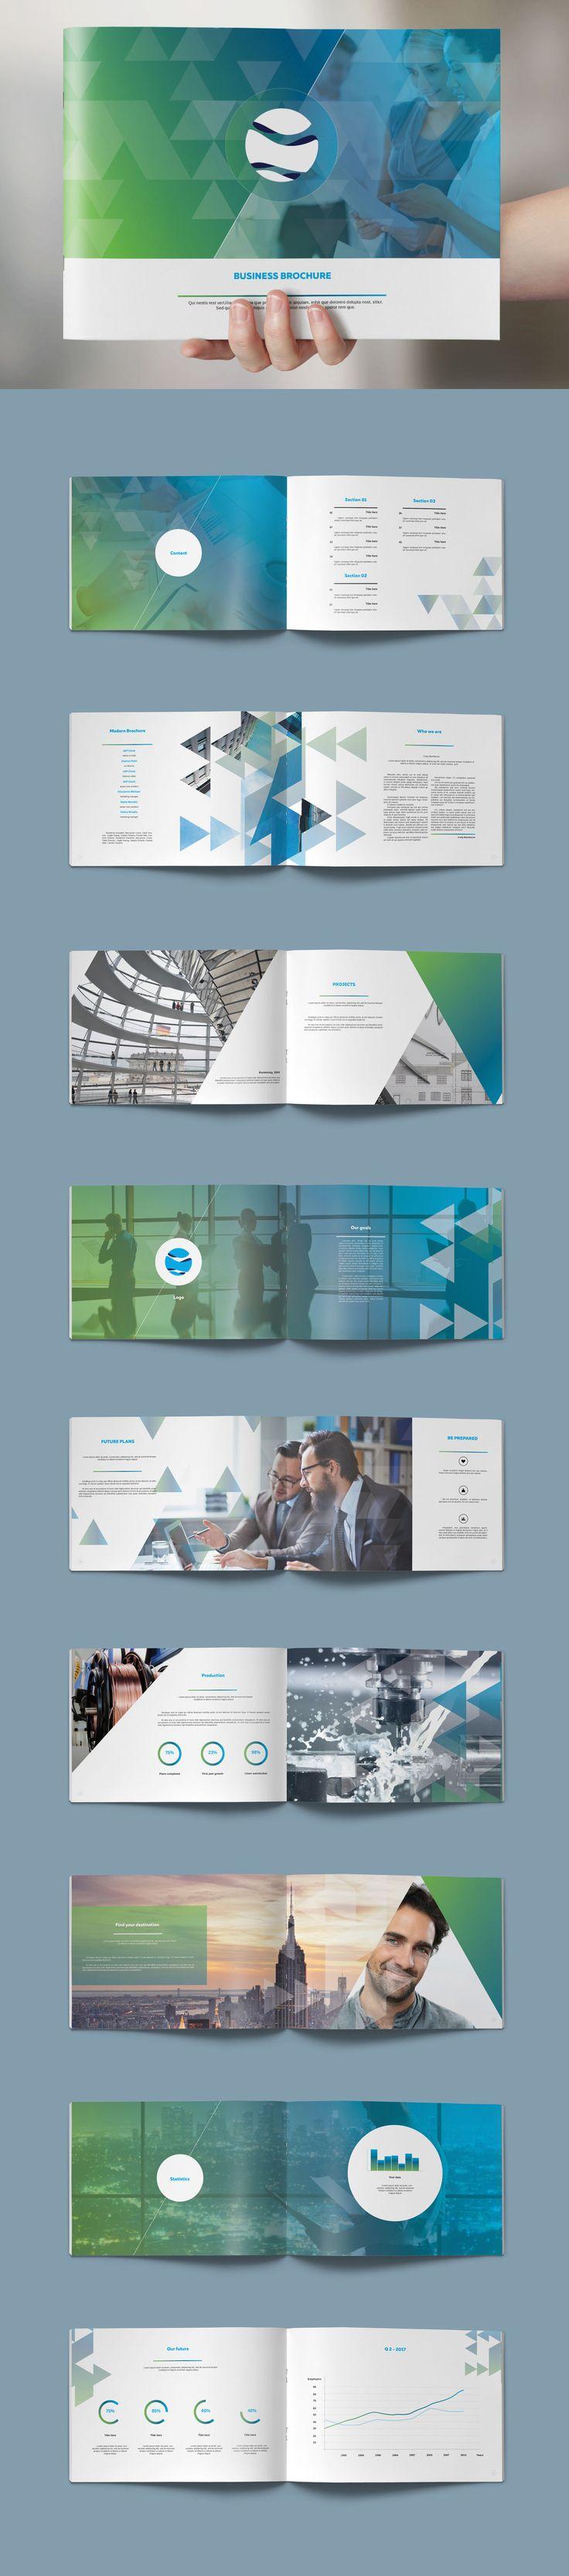 Modern Brochure 22 Pages Design Template InDesign INDD